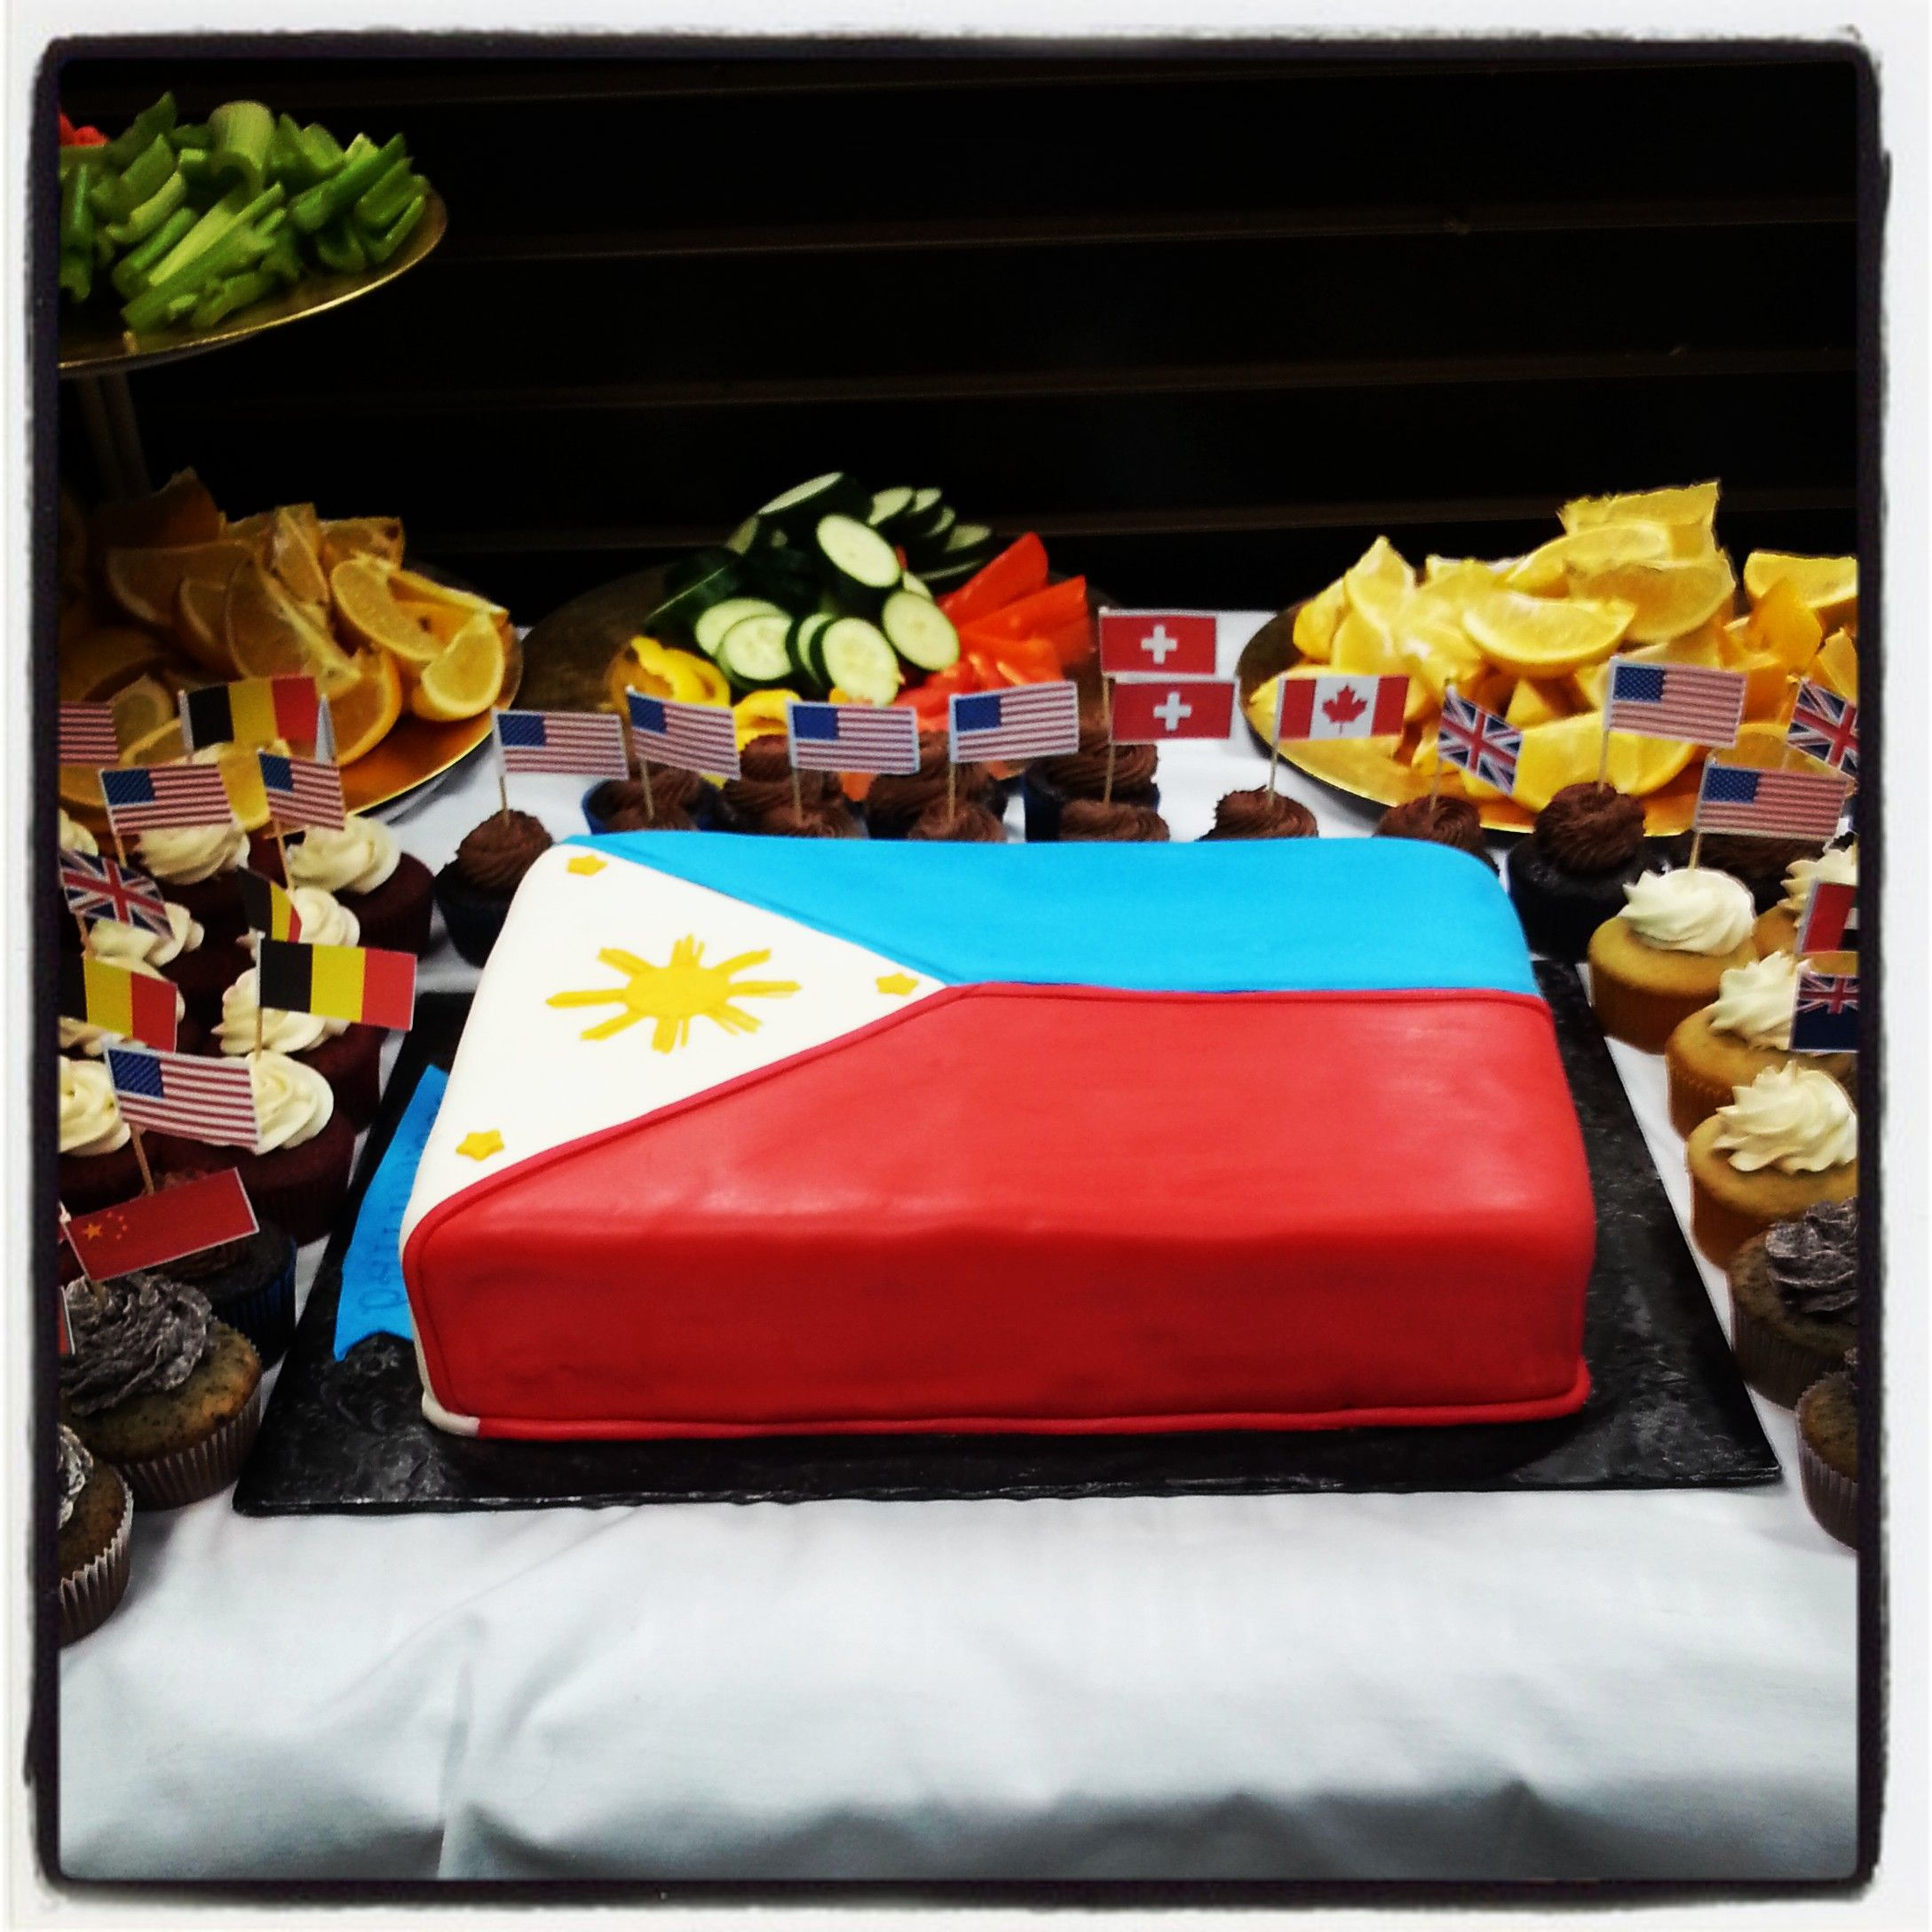 Philippines Flag Cake   Cakes U Crave   Pinterest